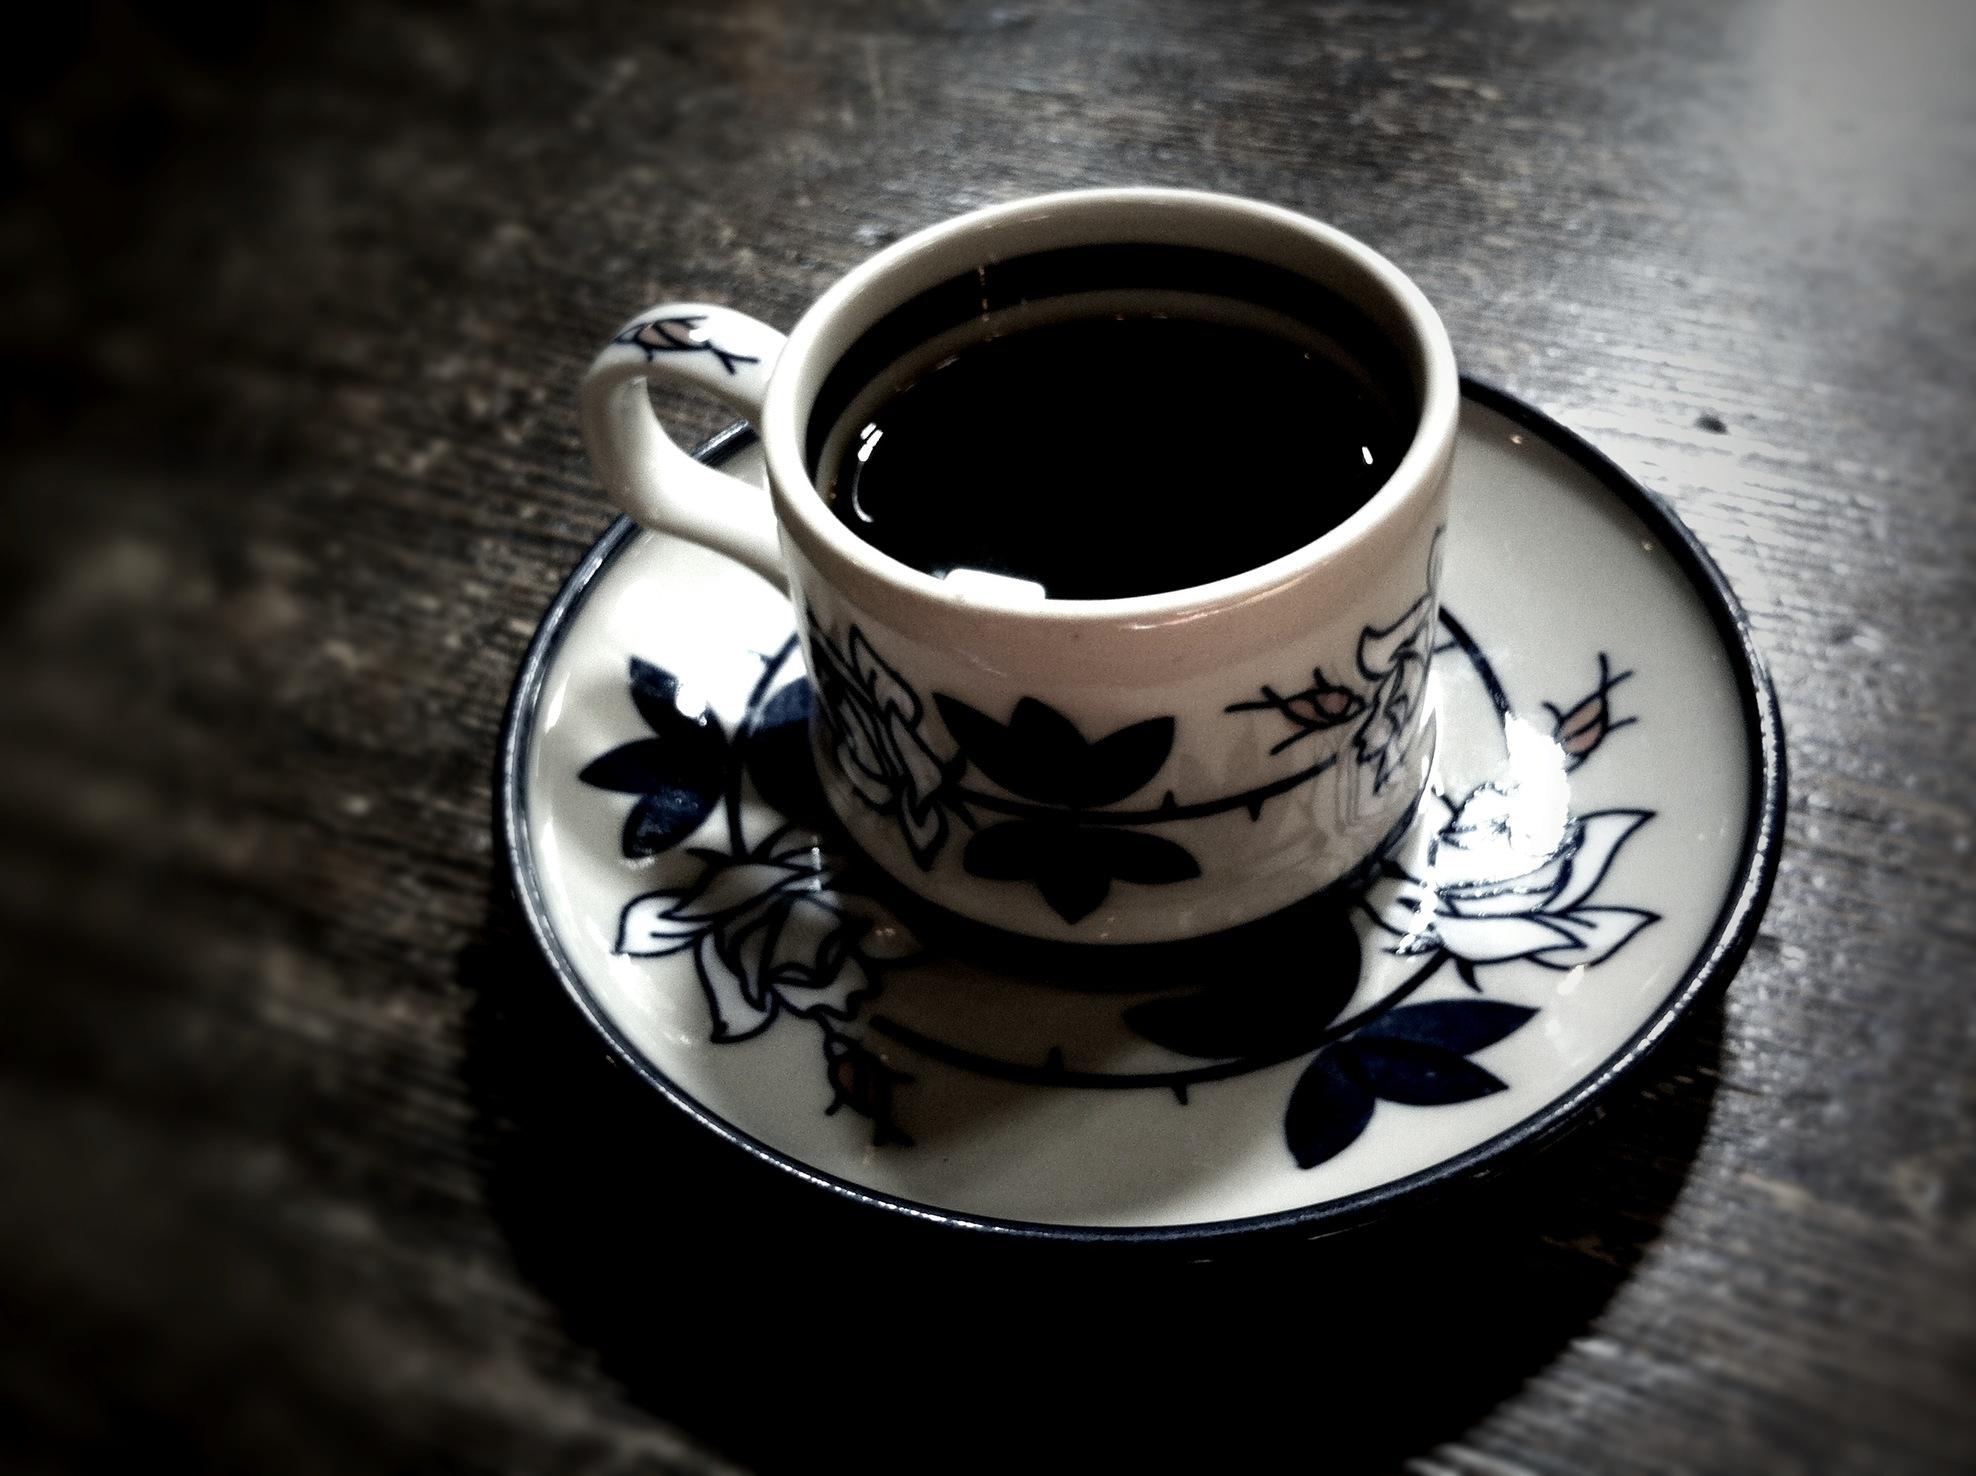 Caferi Fuji